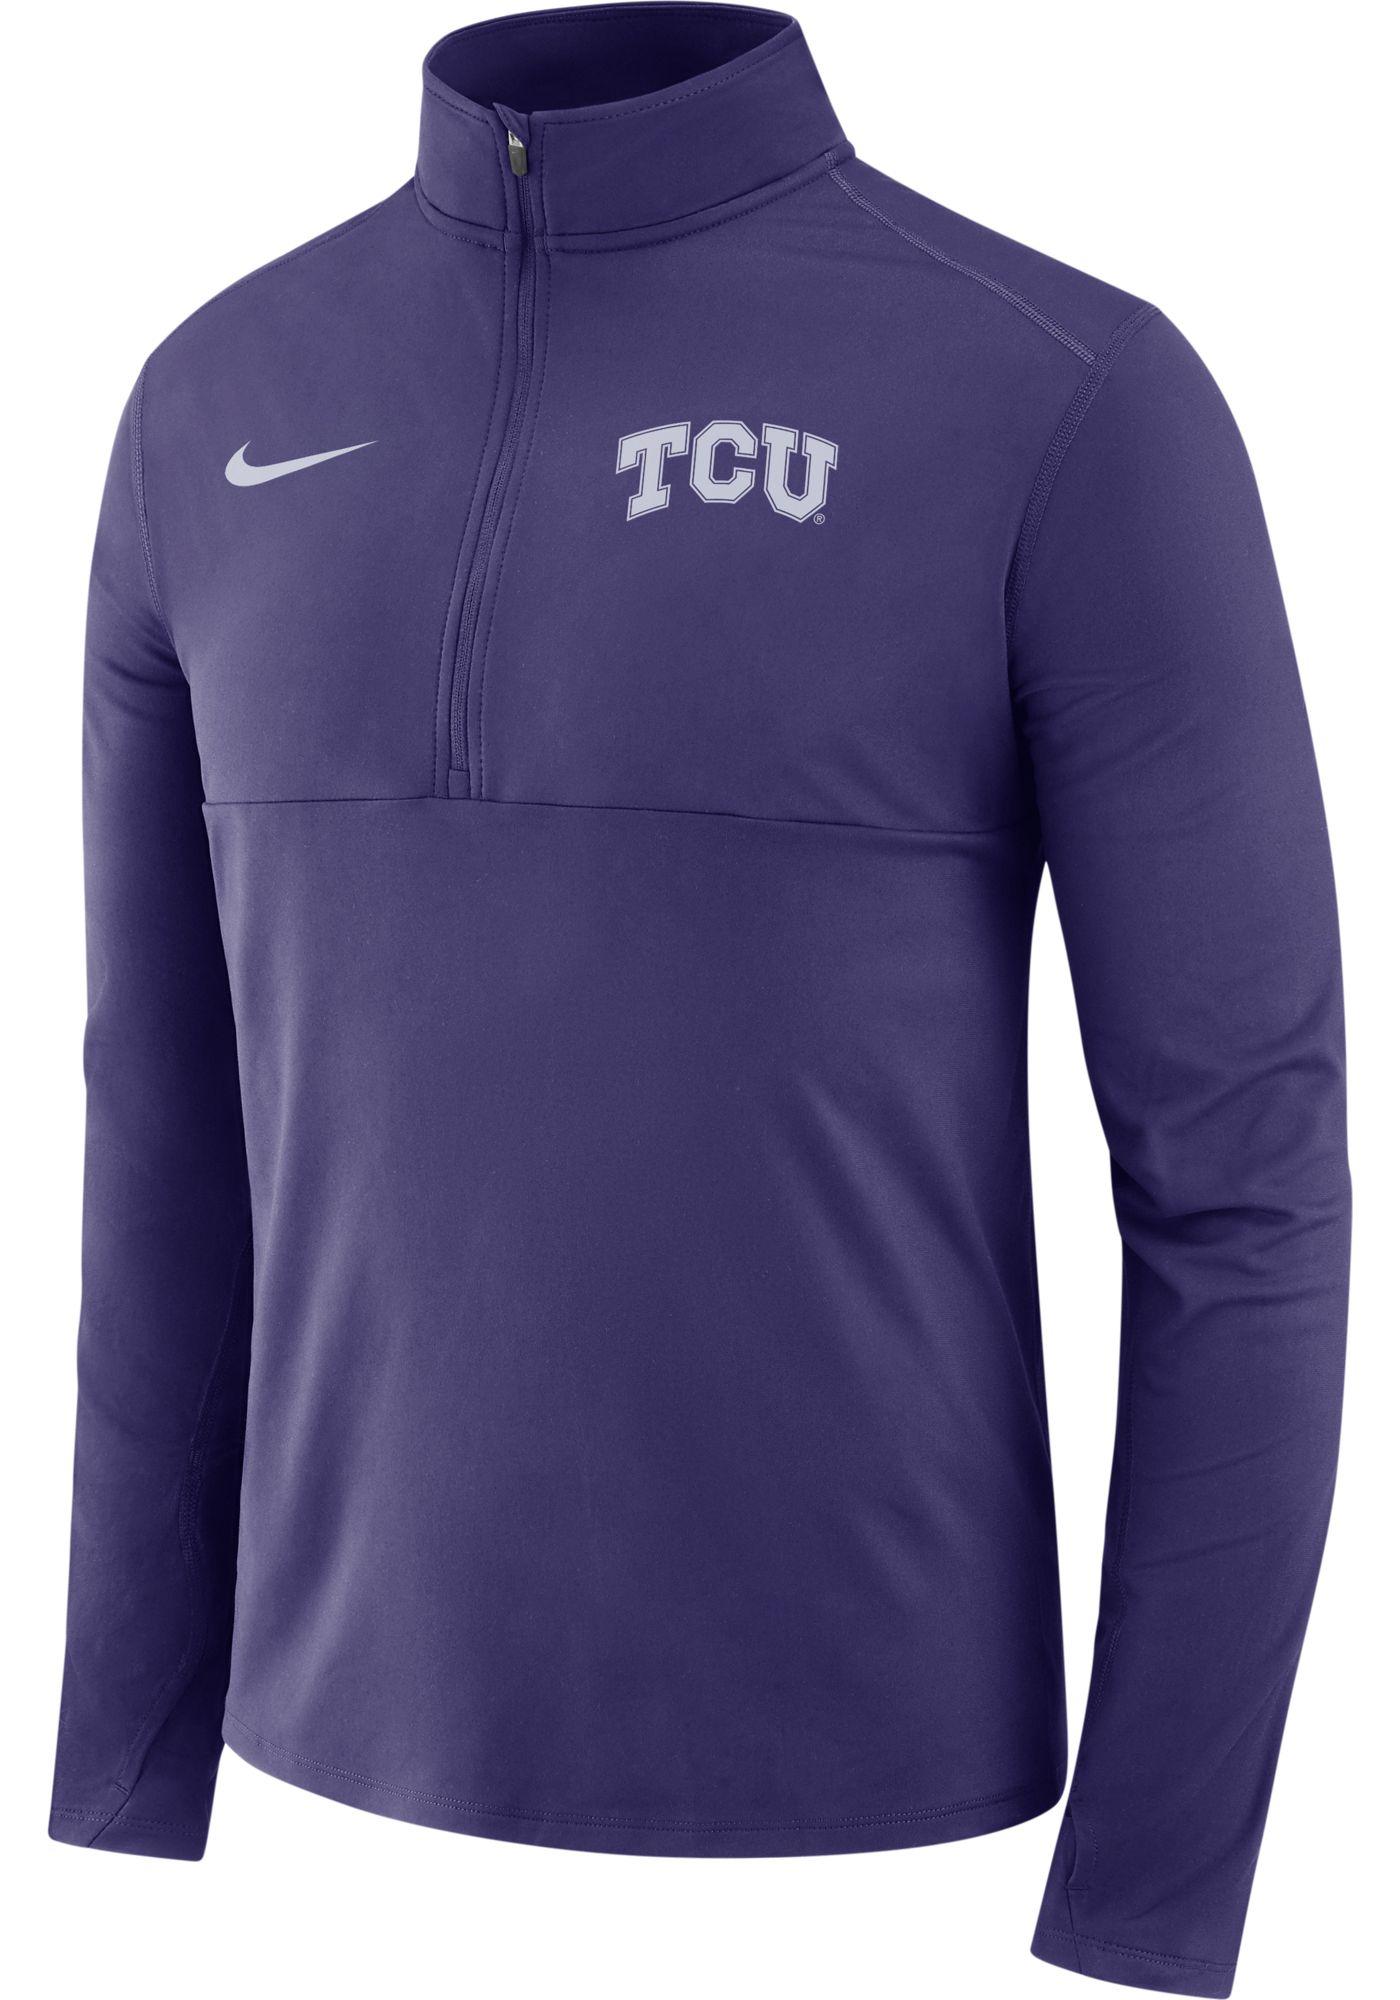 Nike Men's TCU Horned Frogs Purple Long Sleeve Core Half-Zip Shirt